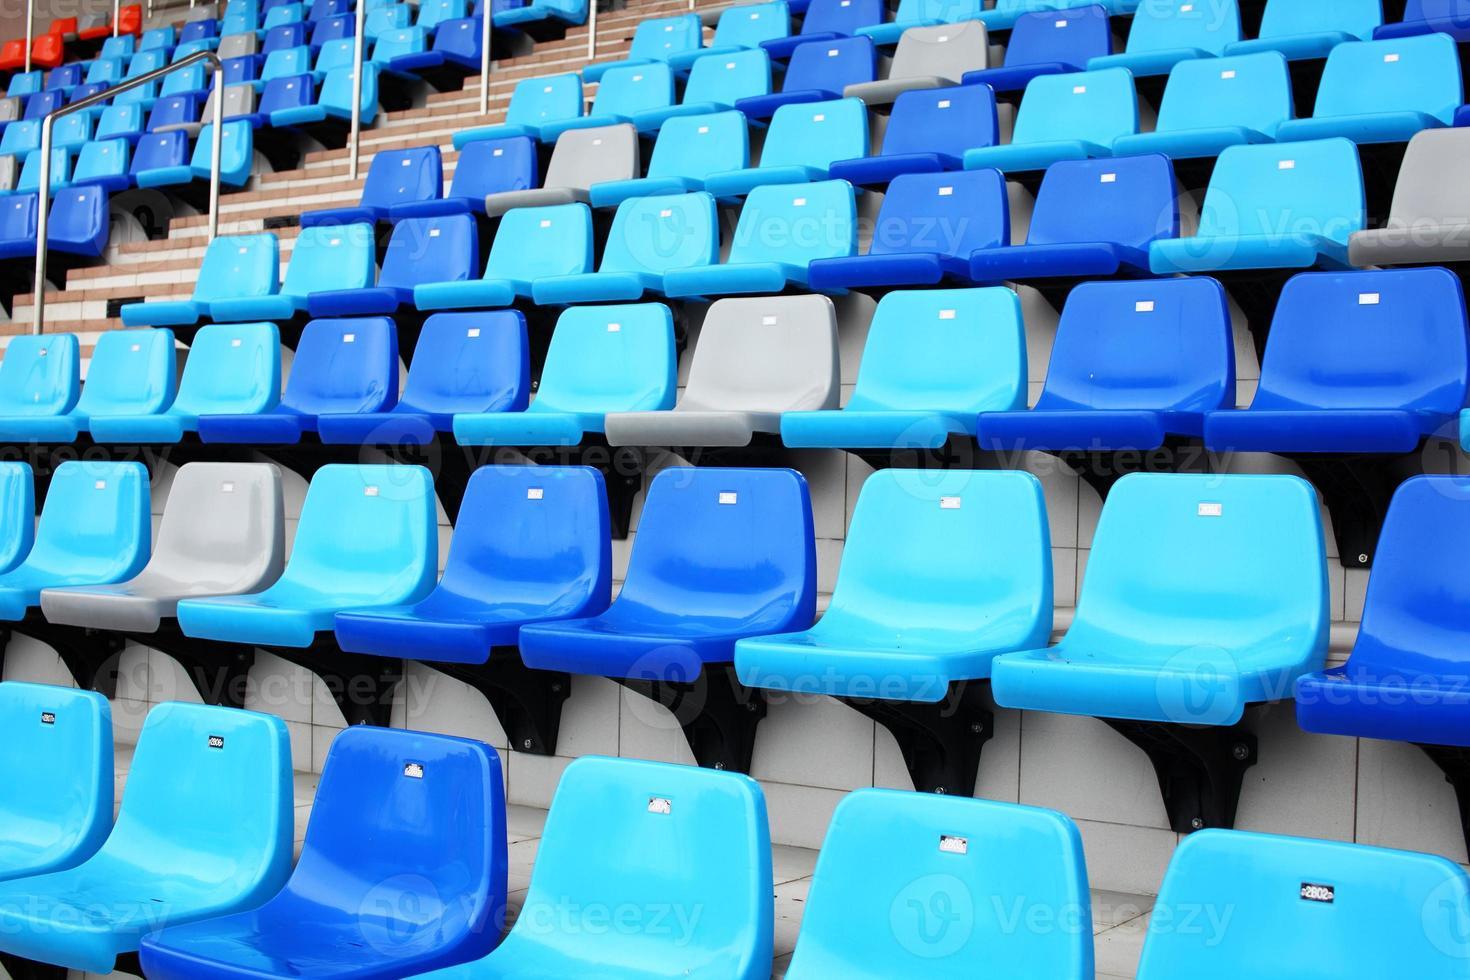 Audience seat in stadium photo